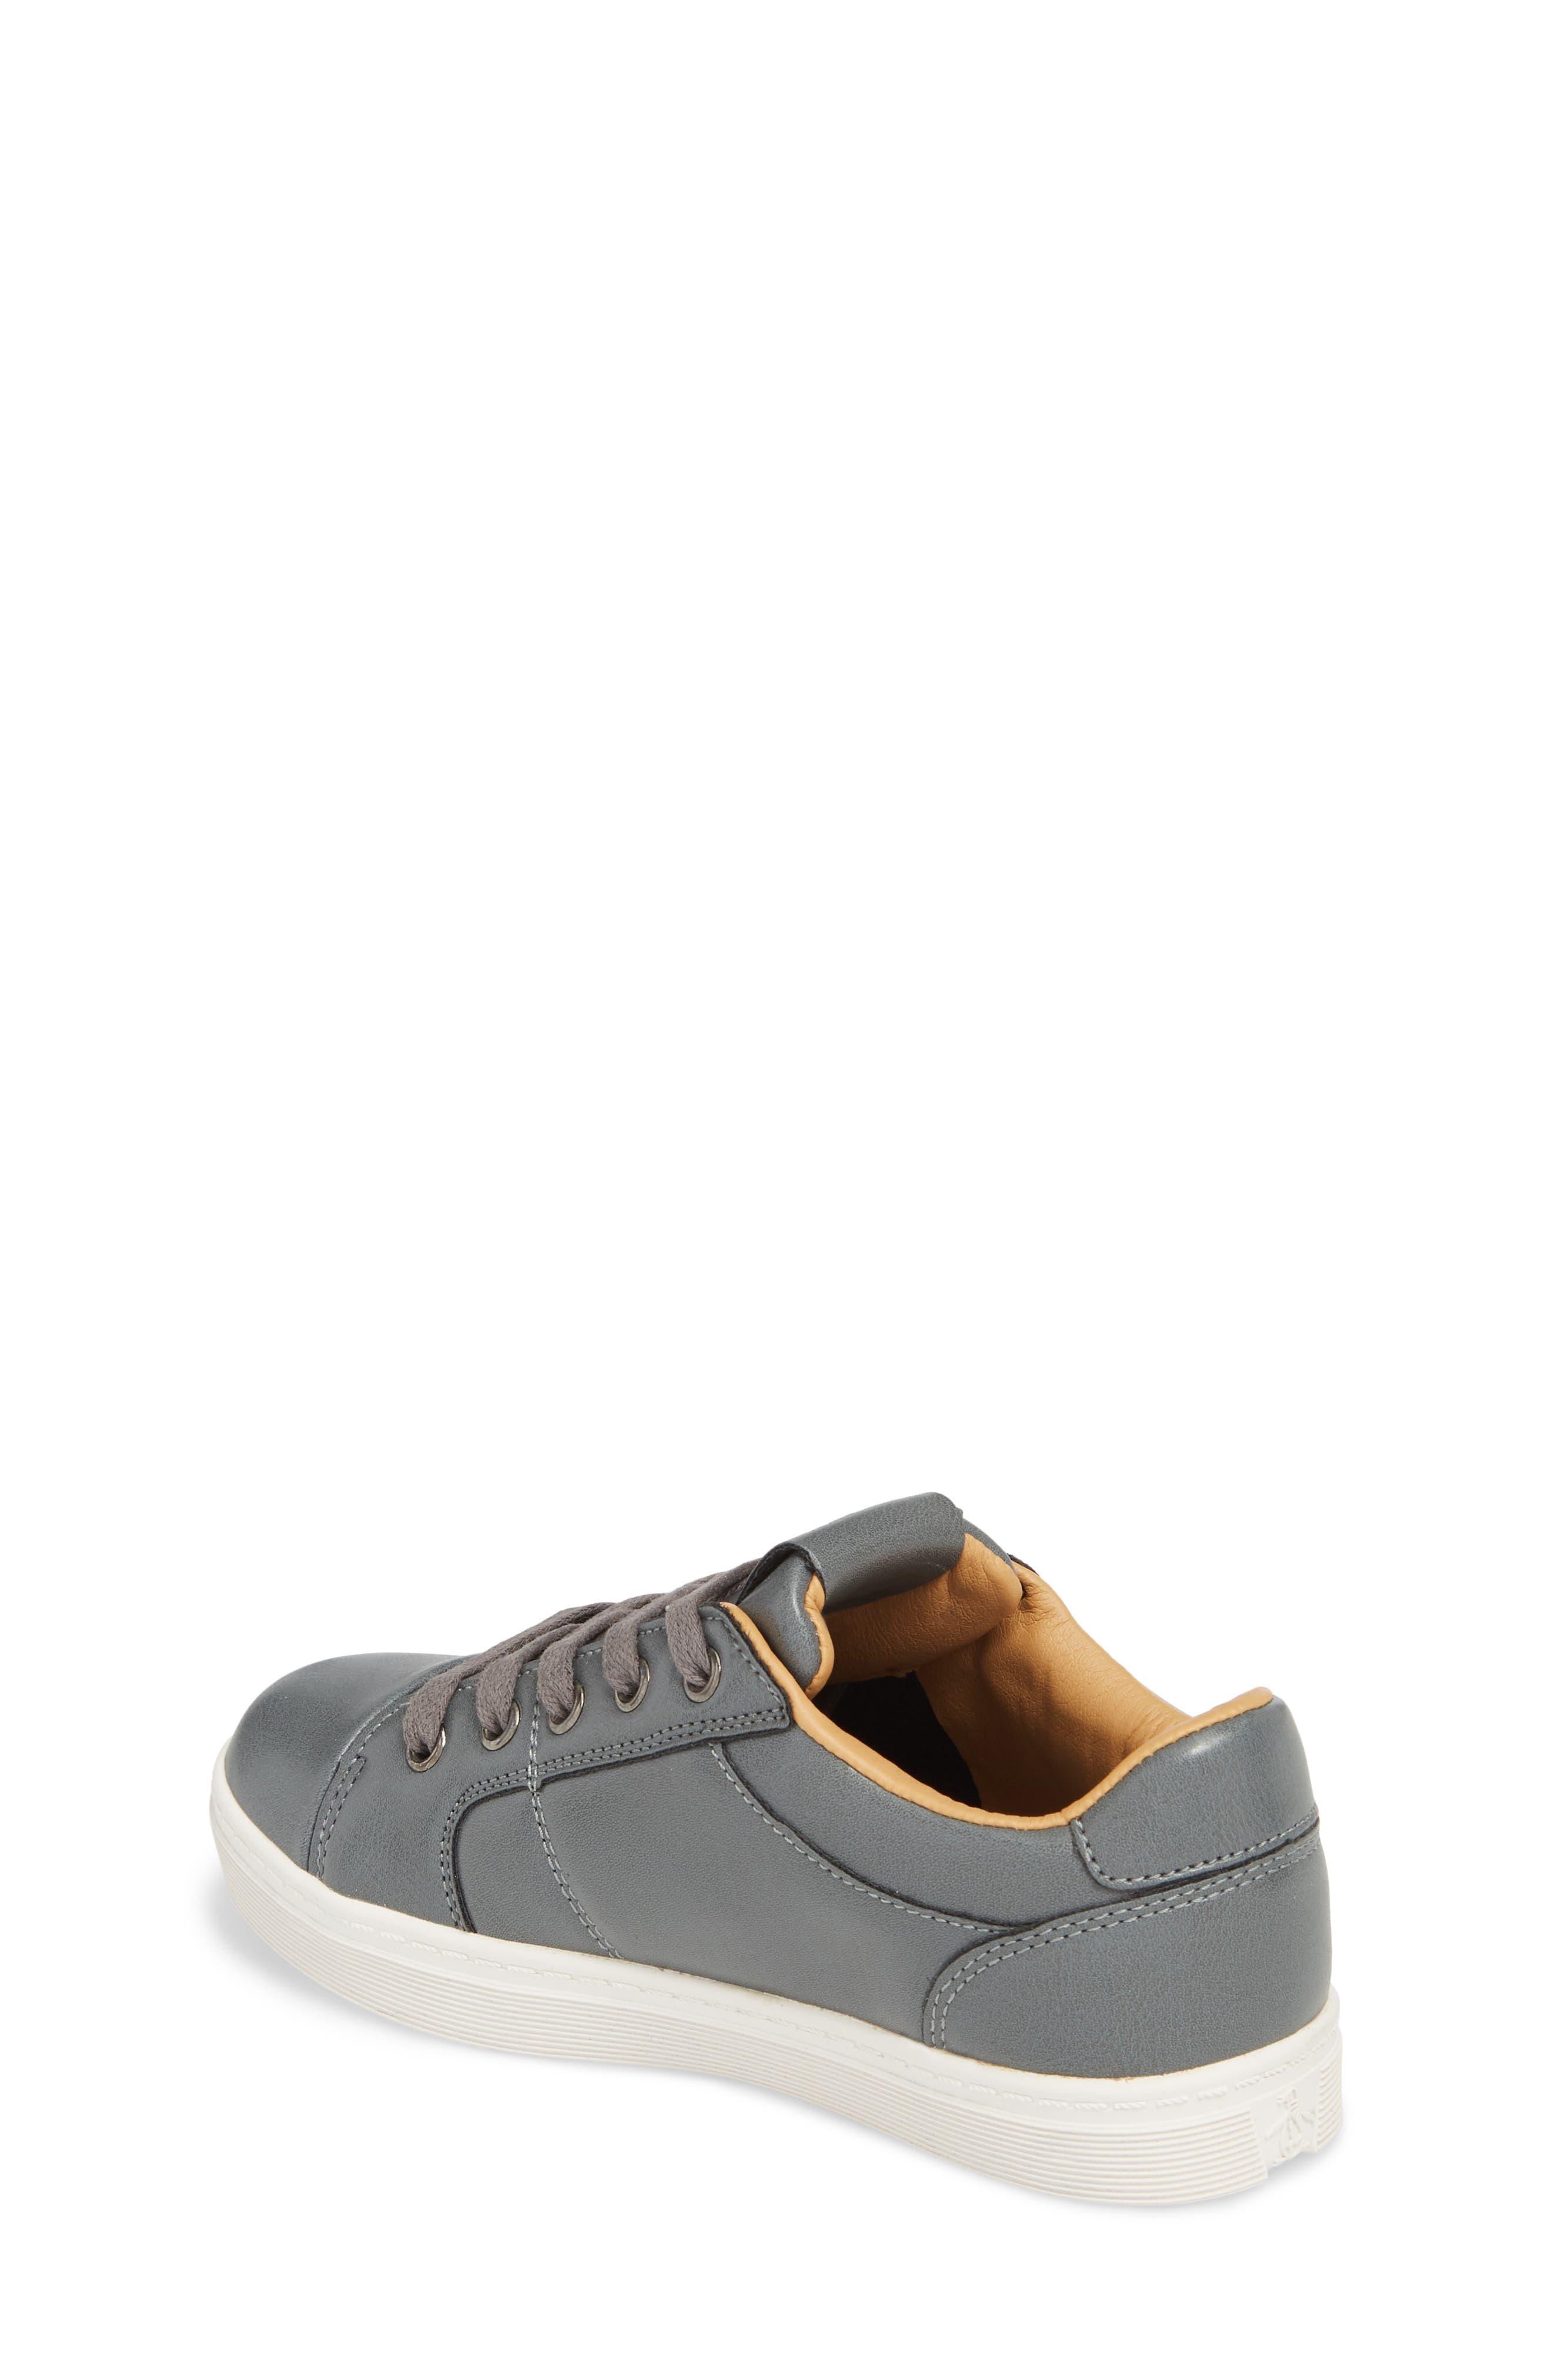 Cobin Sneaker,                             Alternate thumbnail 2, color,                             020